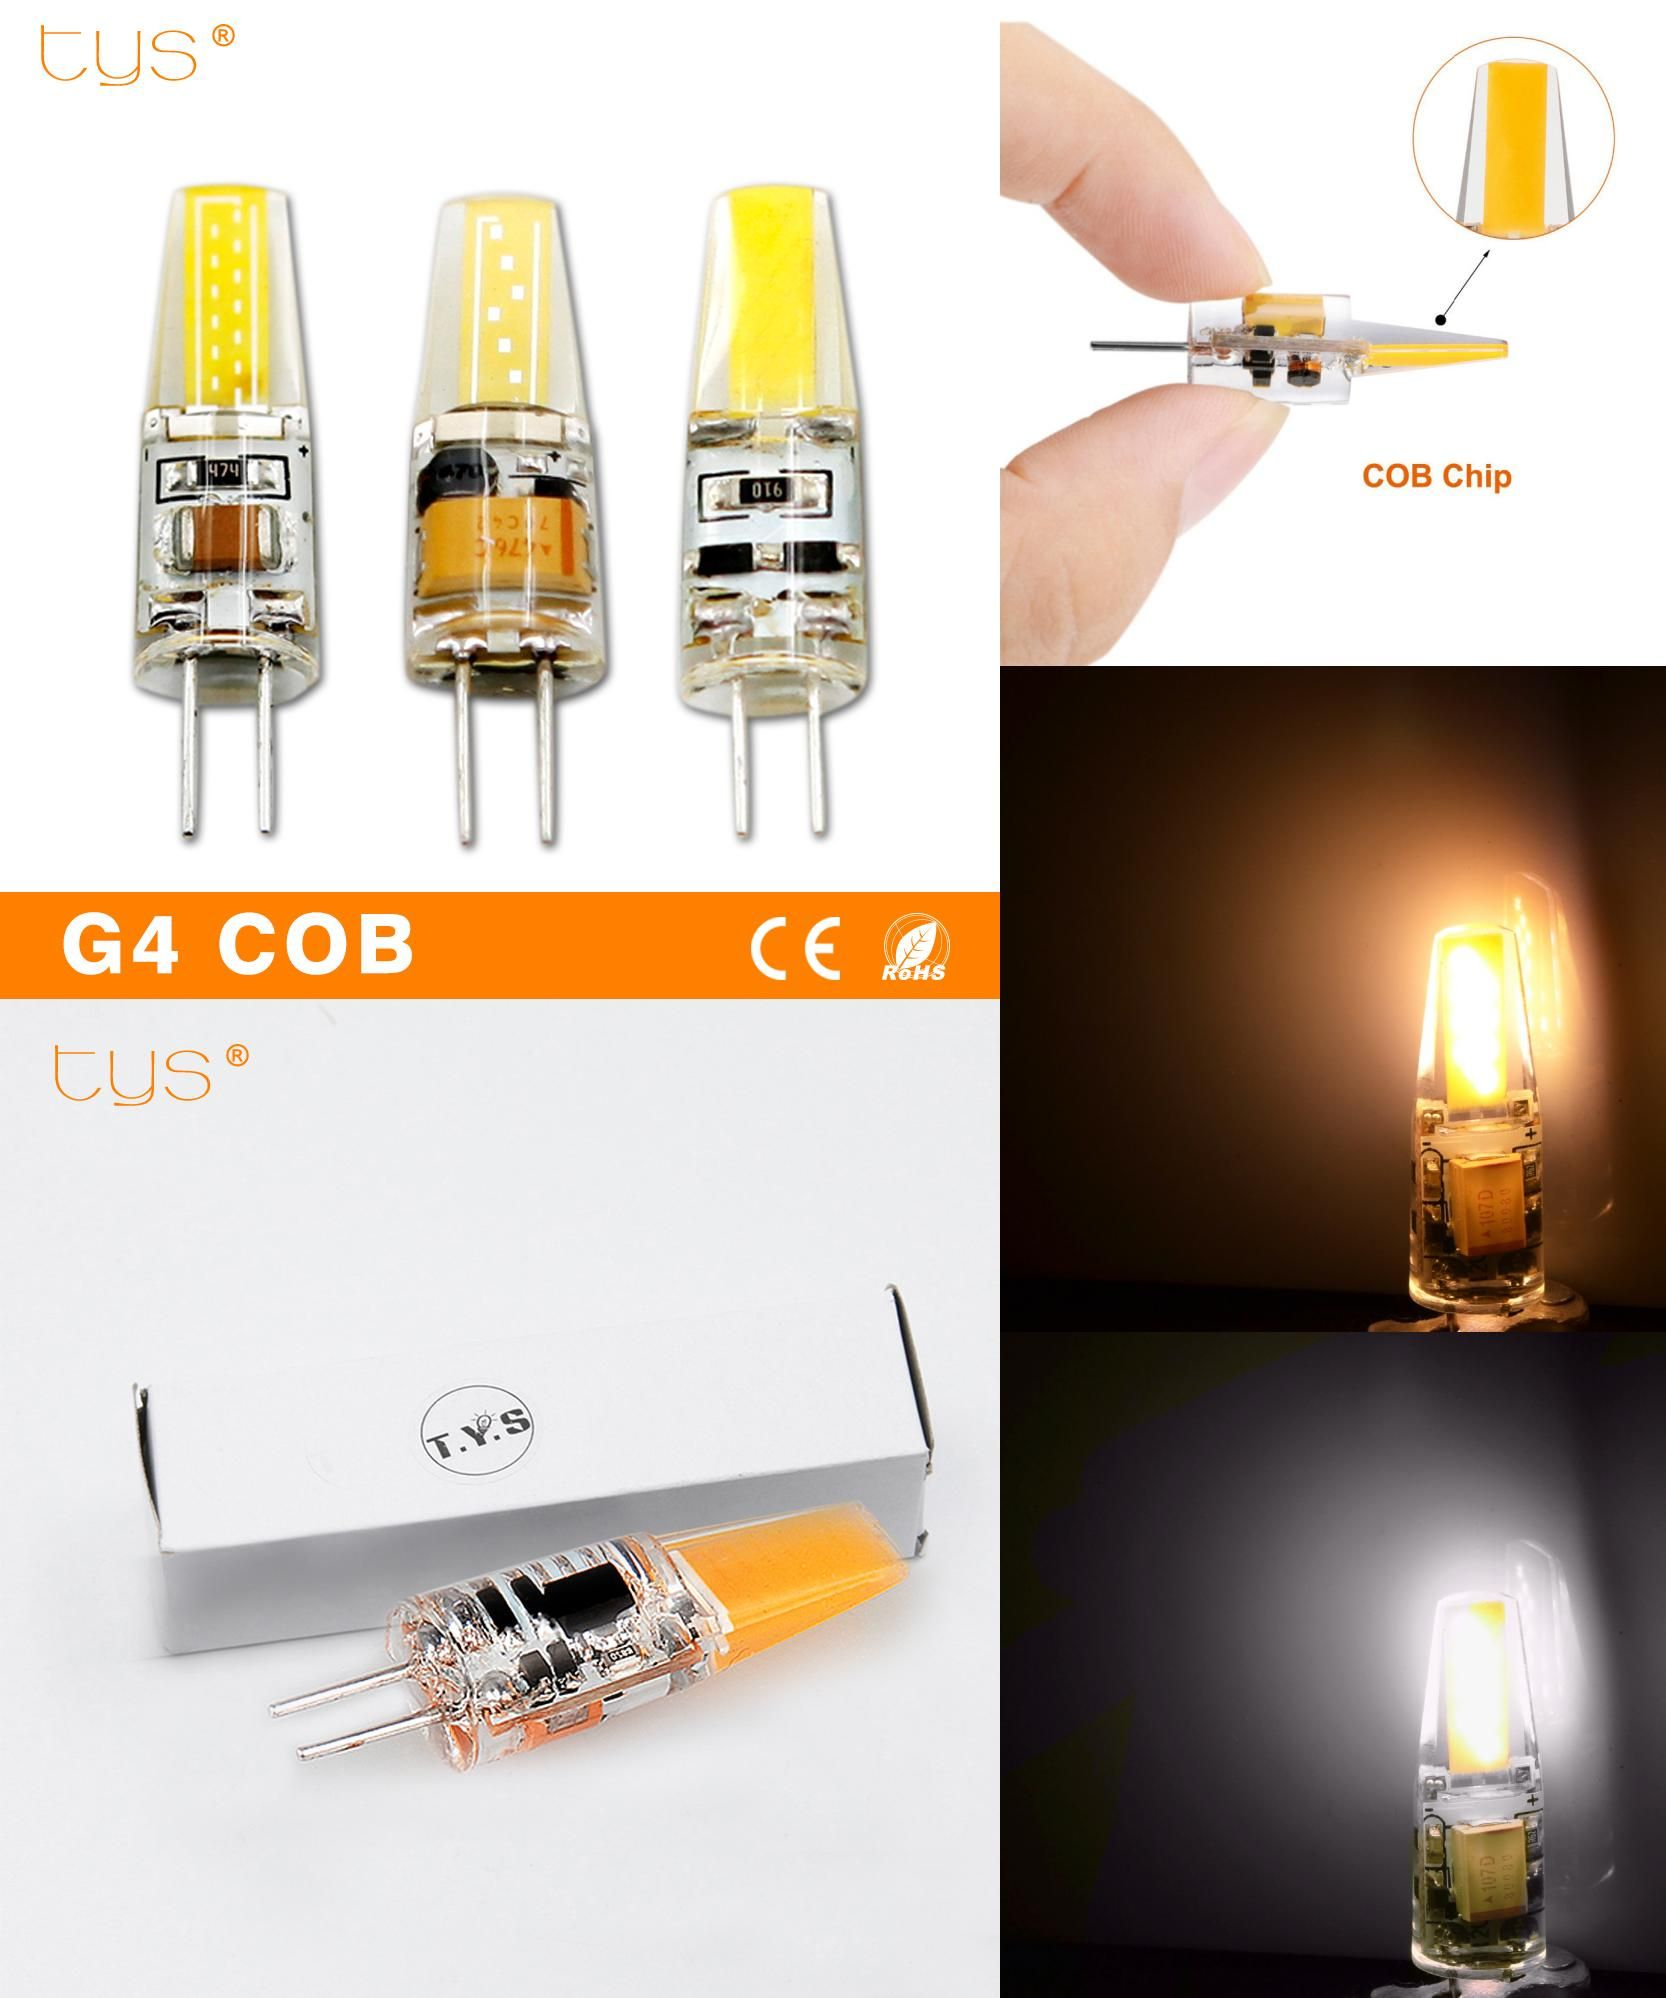 Visit To Buy Led G4 Lamp Cob 1505 Ac 220v Lampada Led 12v Light Bulbs Chip Dc12v High Bright Bombillas Ampoule Led Light Bulb Fo Light Bulb Bulb Led